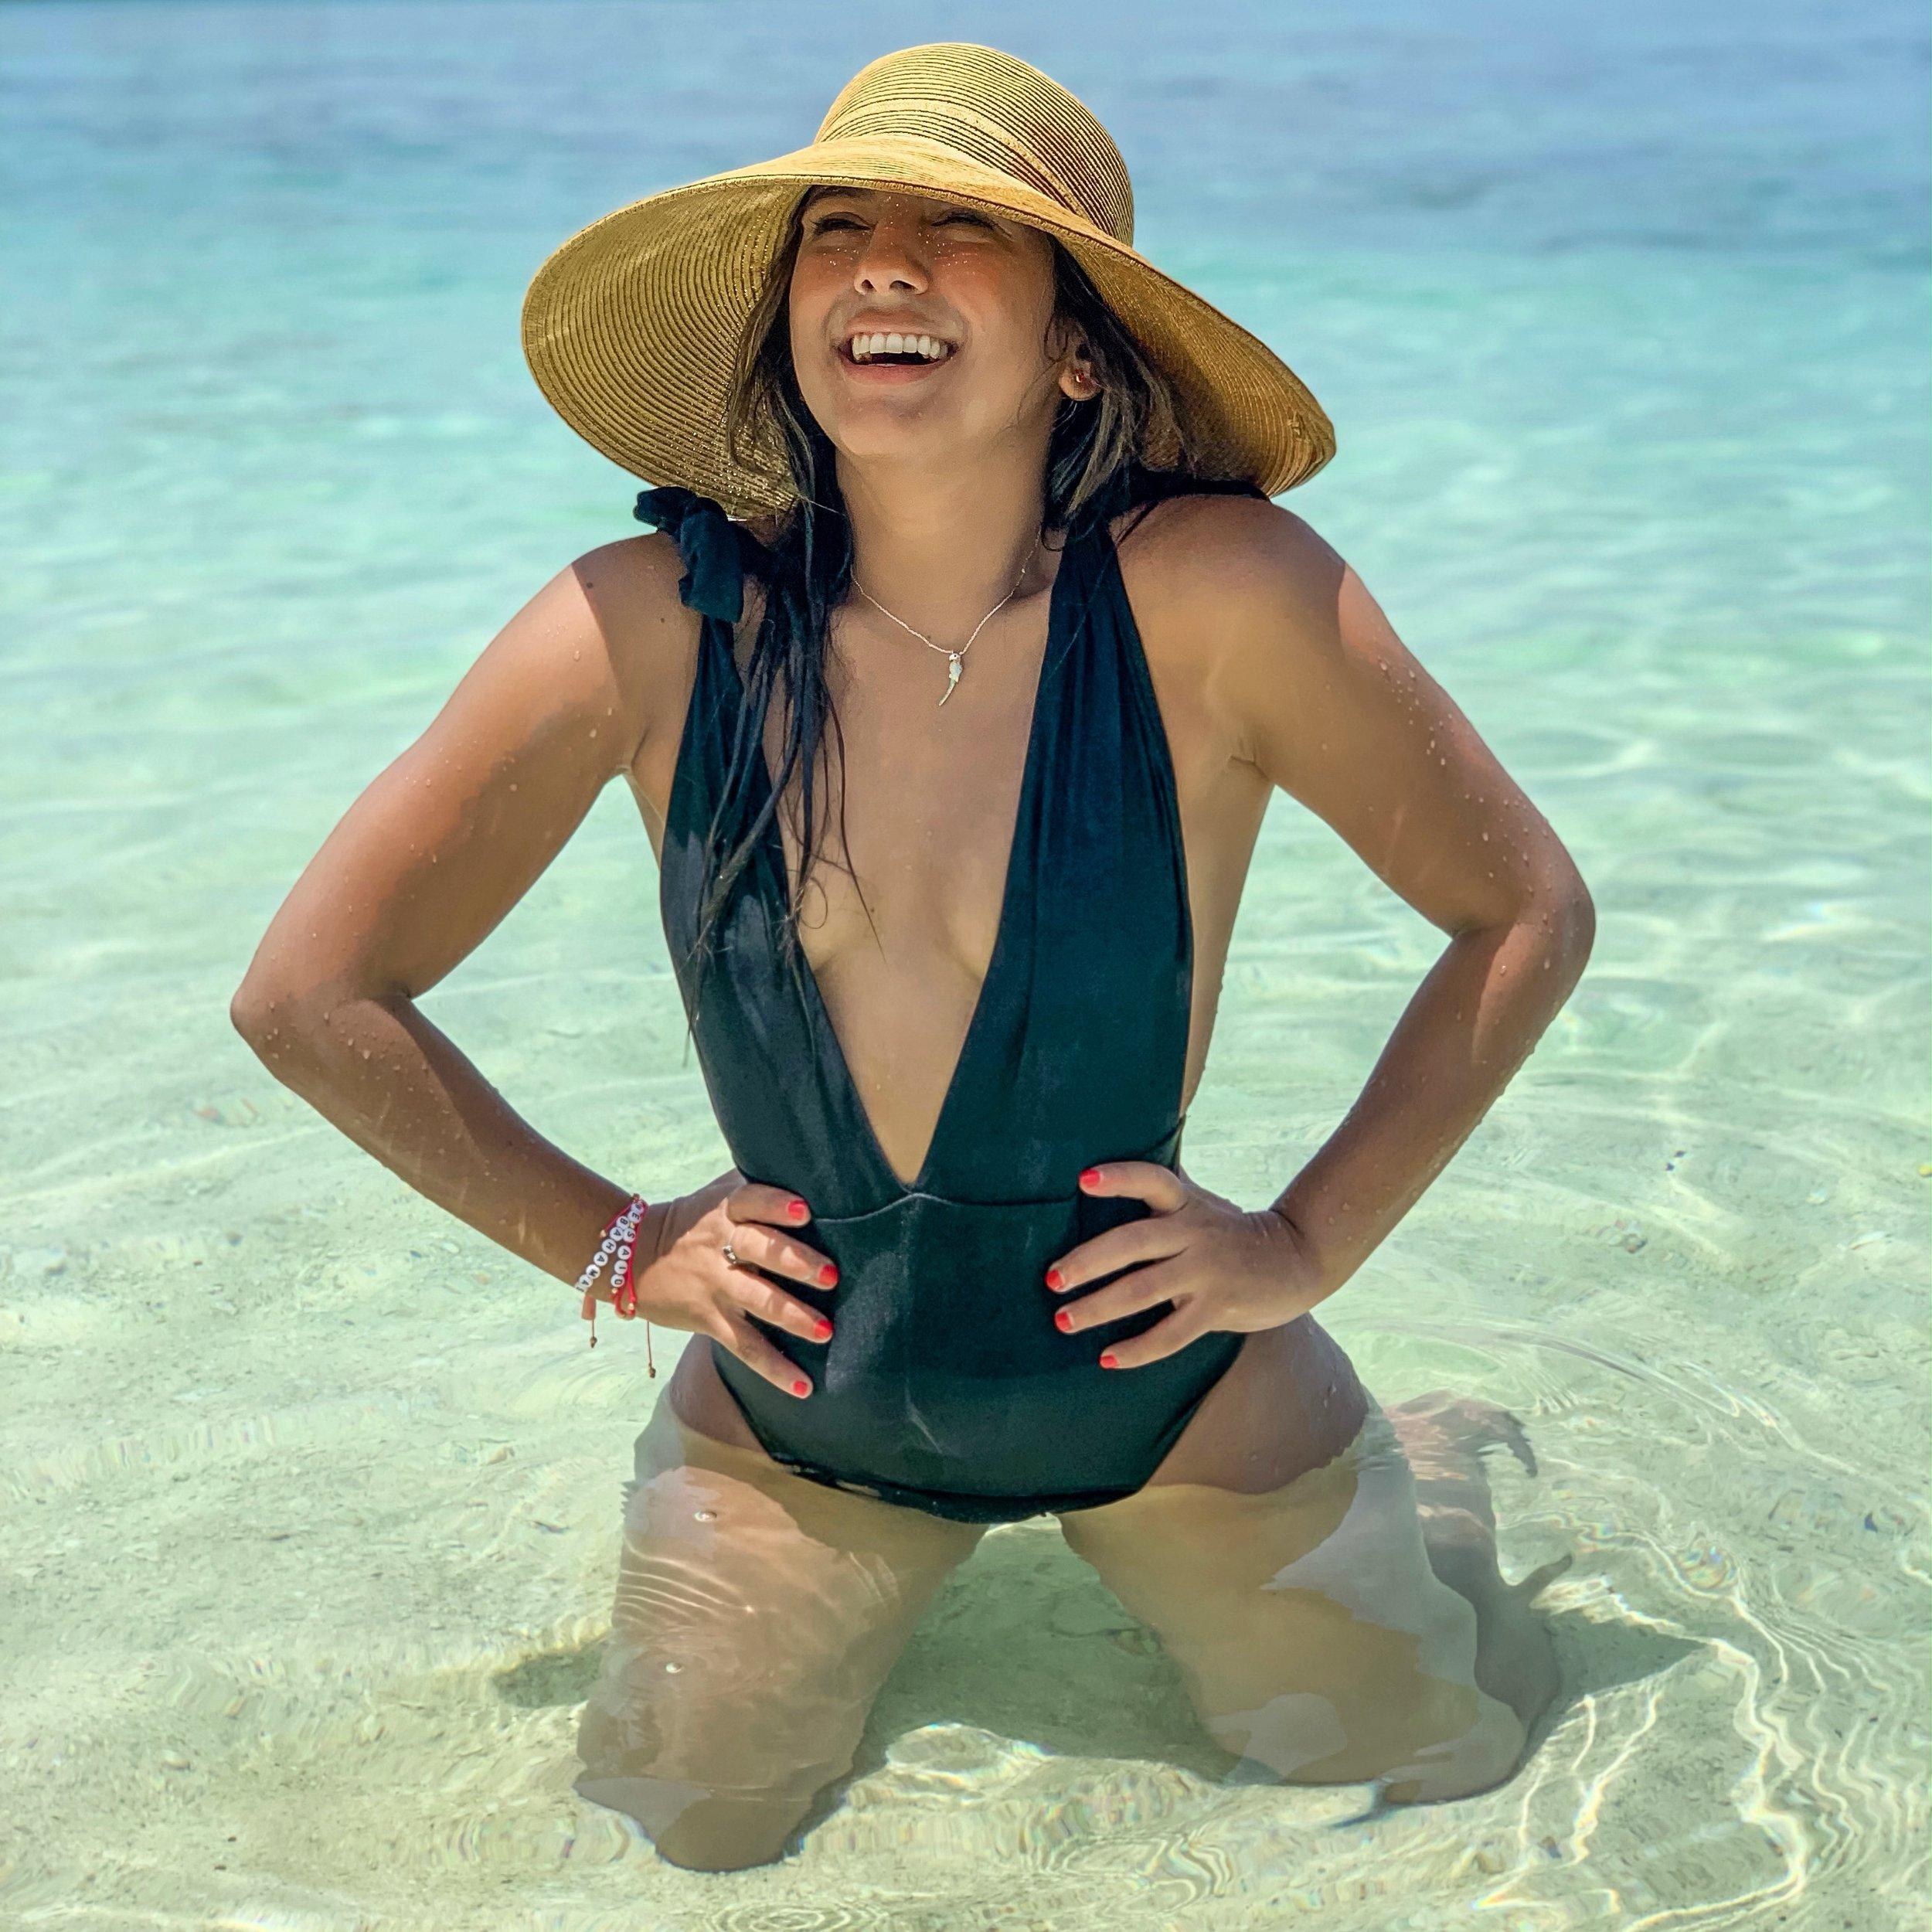 paloma de la cruz fashion travel blogger palomatravels ideals bahamas cruise